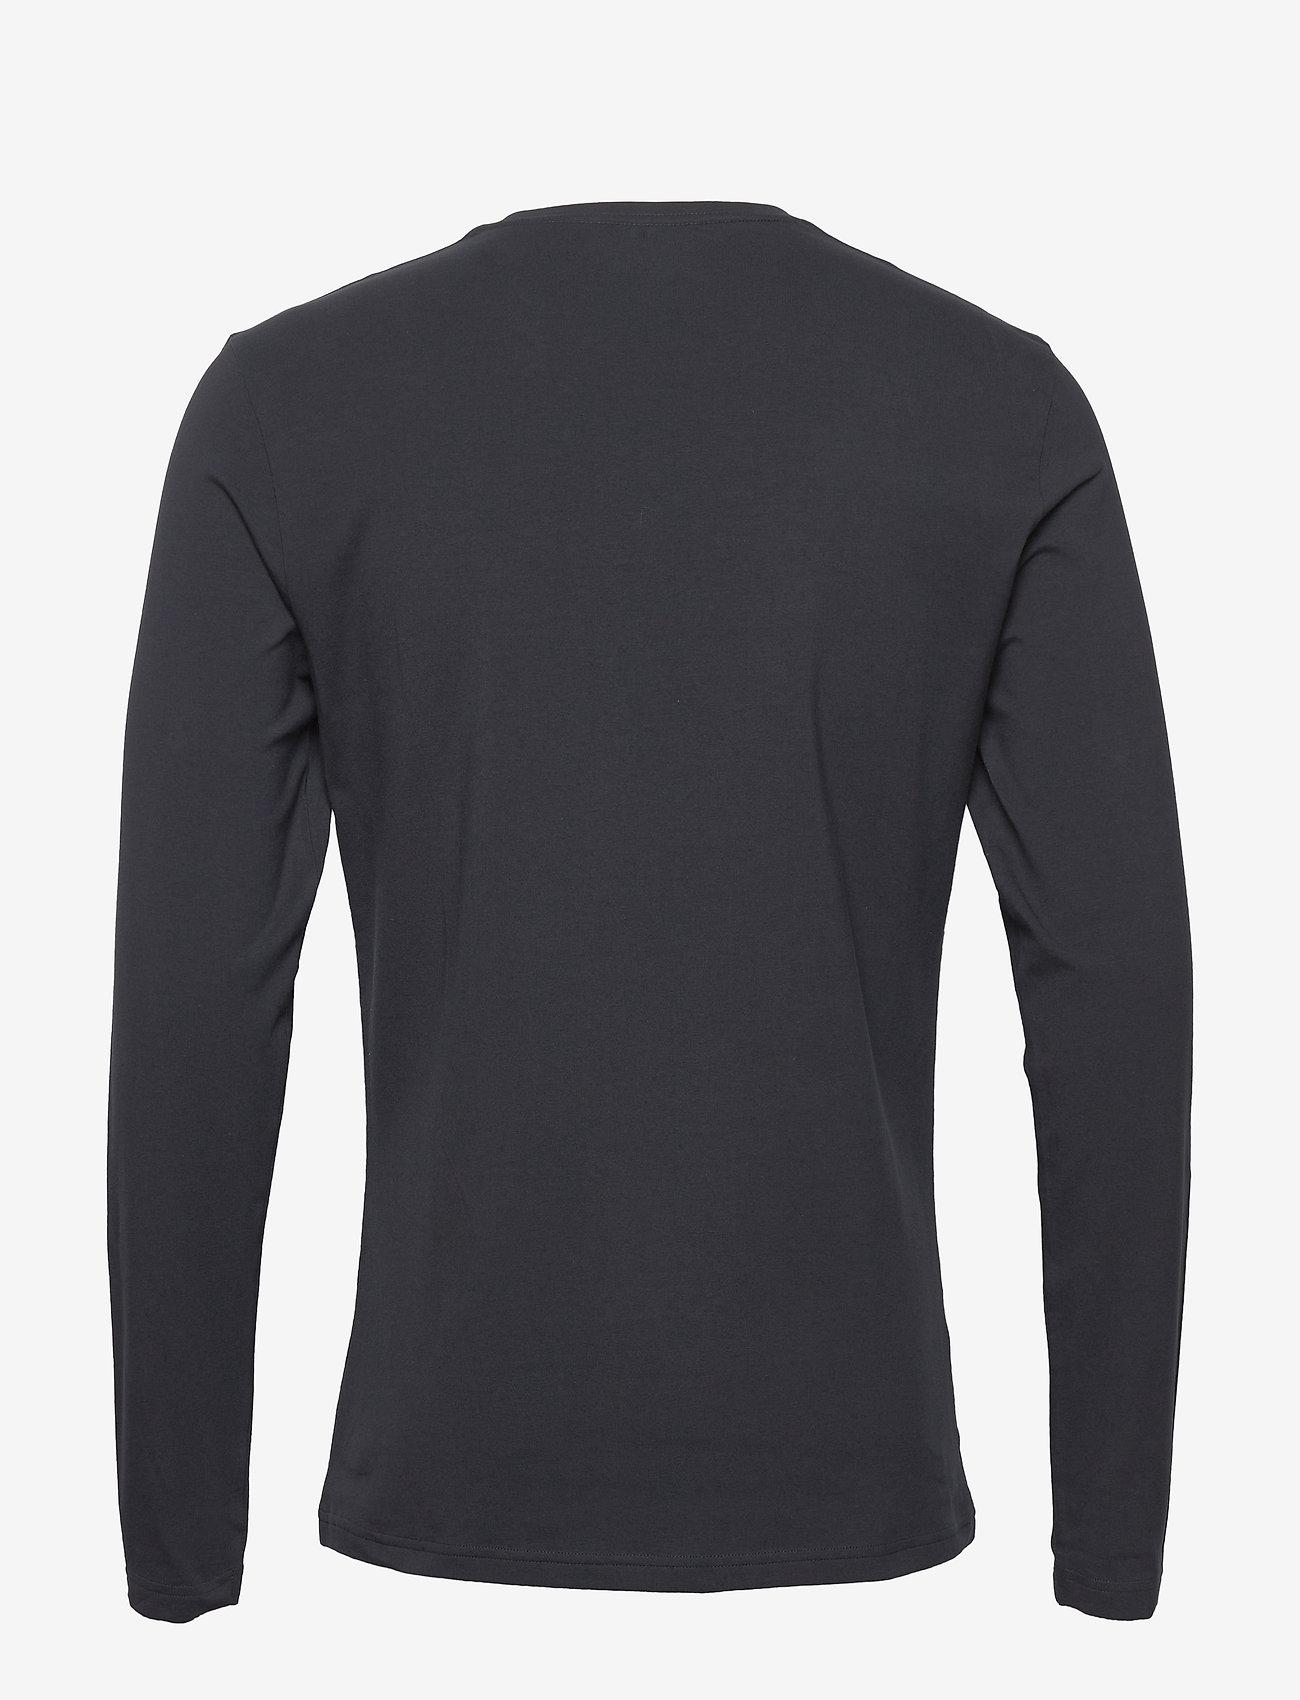 Bread & Boxers - Long sleeve - basic t-shirts - dark navy - 1